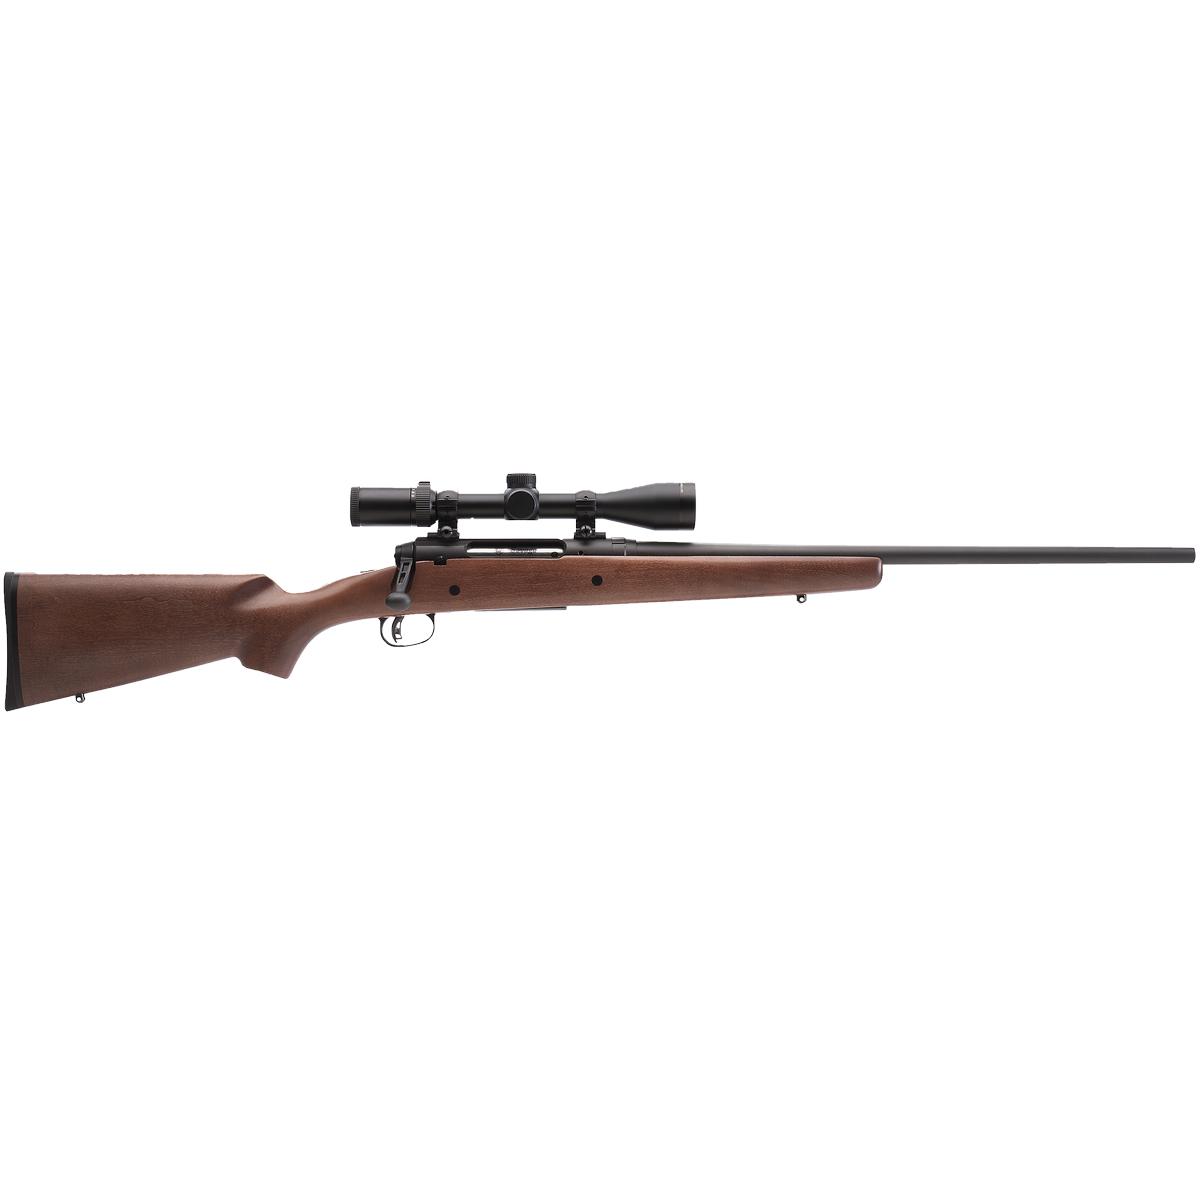 Savage Axis II XP Hardwood Centerfire Rifle Package, .223 Rem.